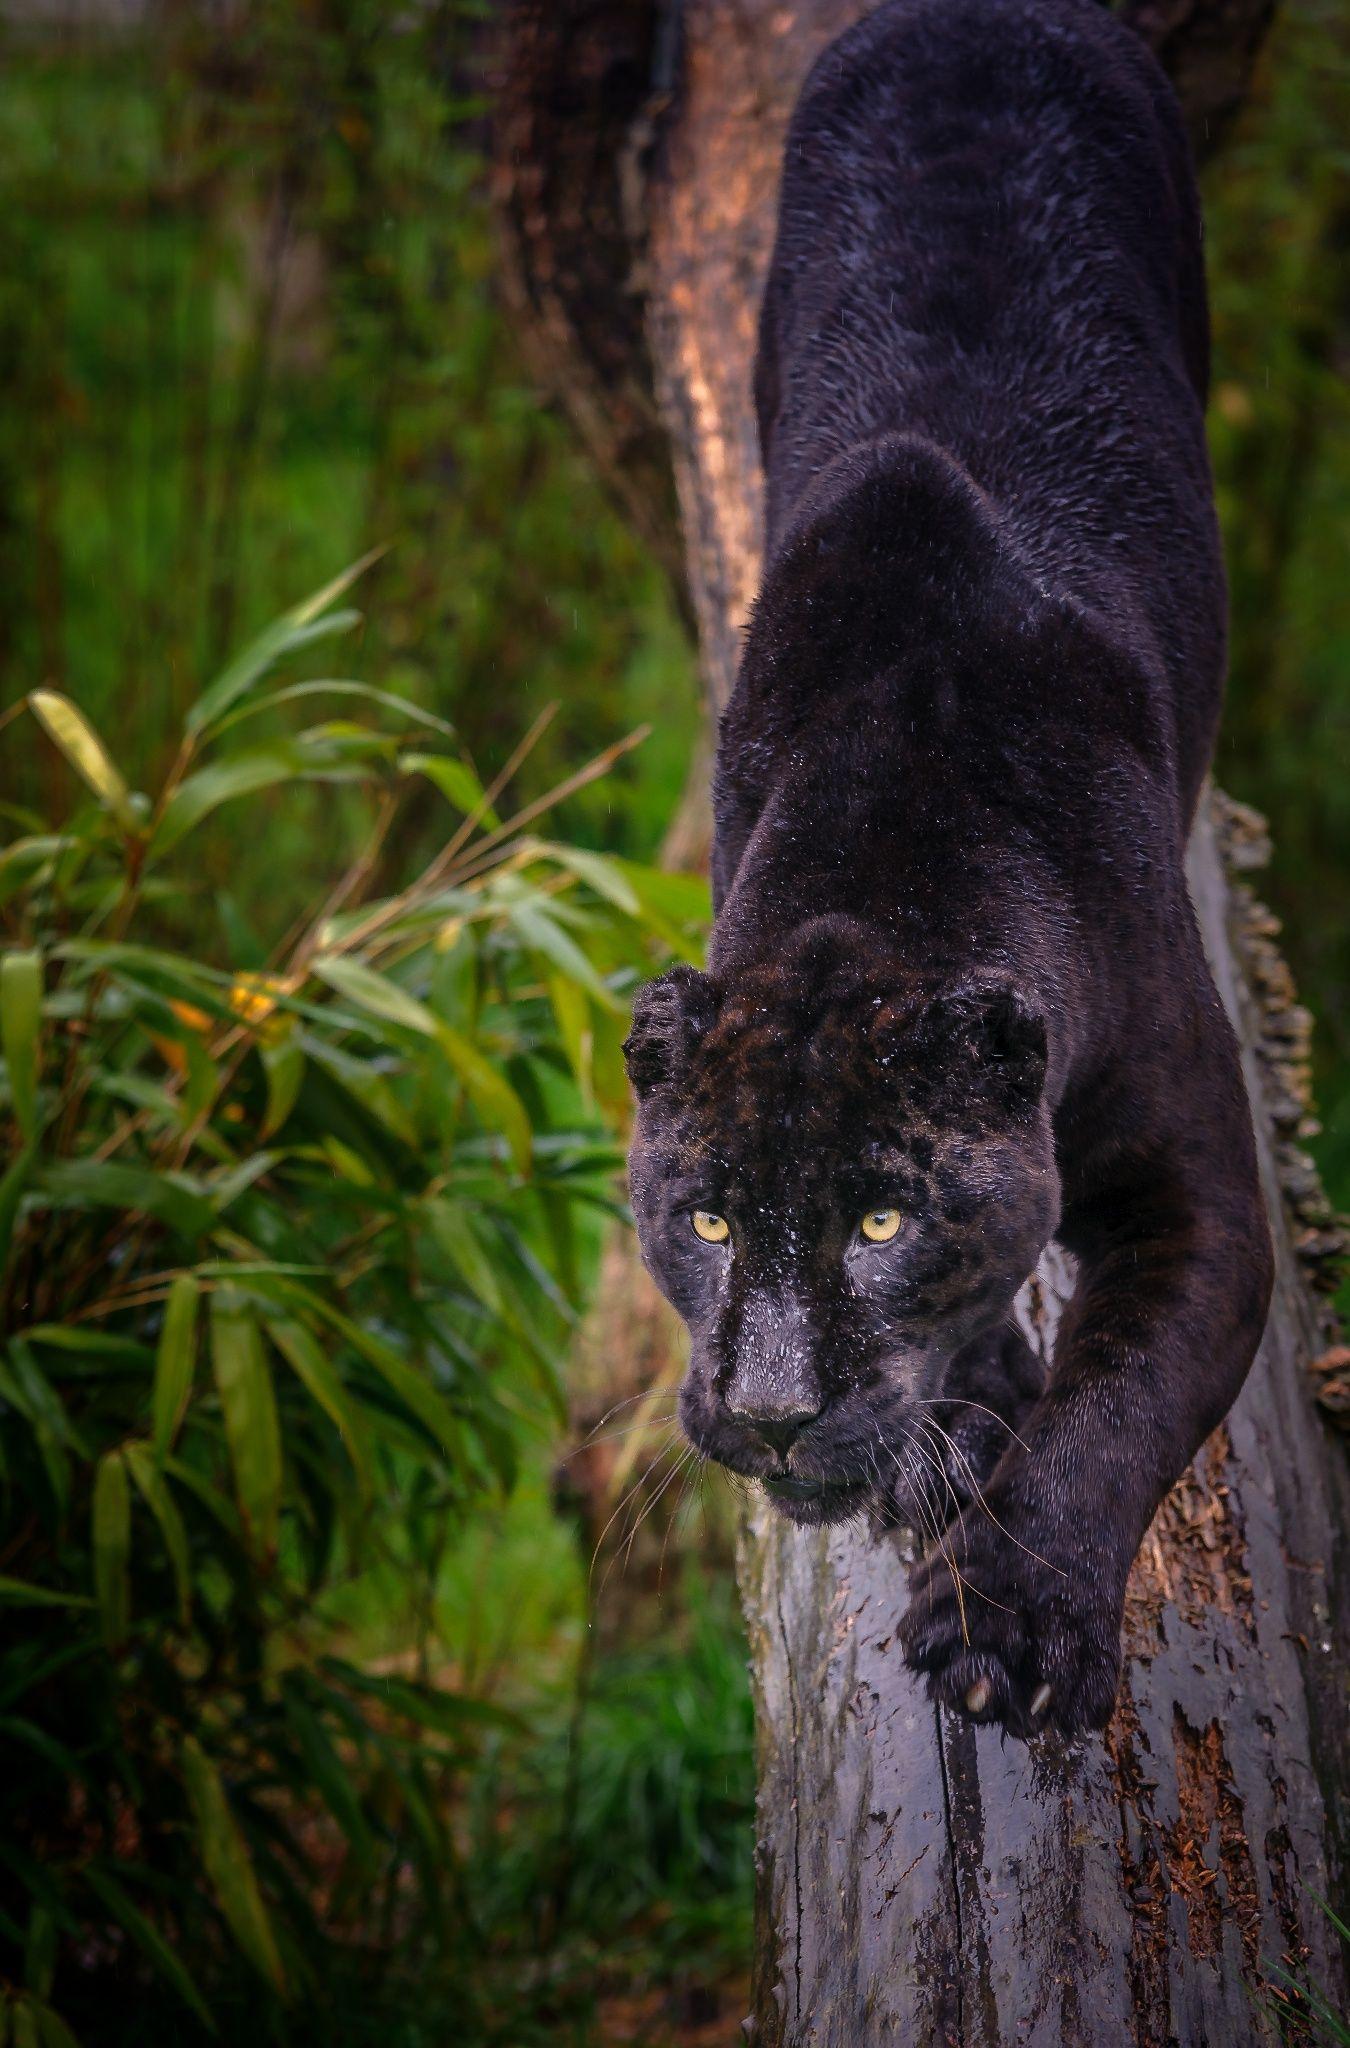 интернет-магазине фото дикого черного ягуара гравити